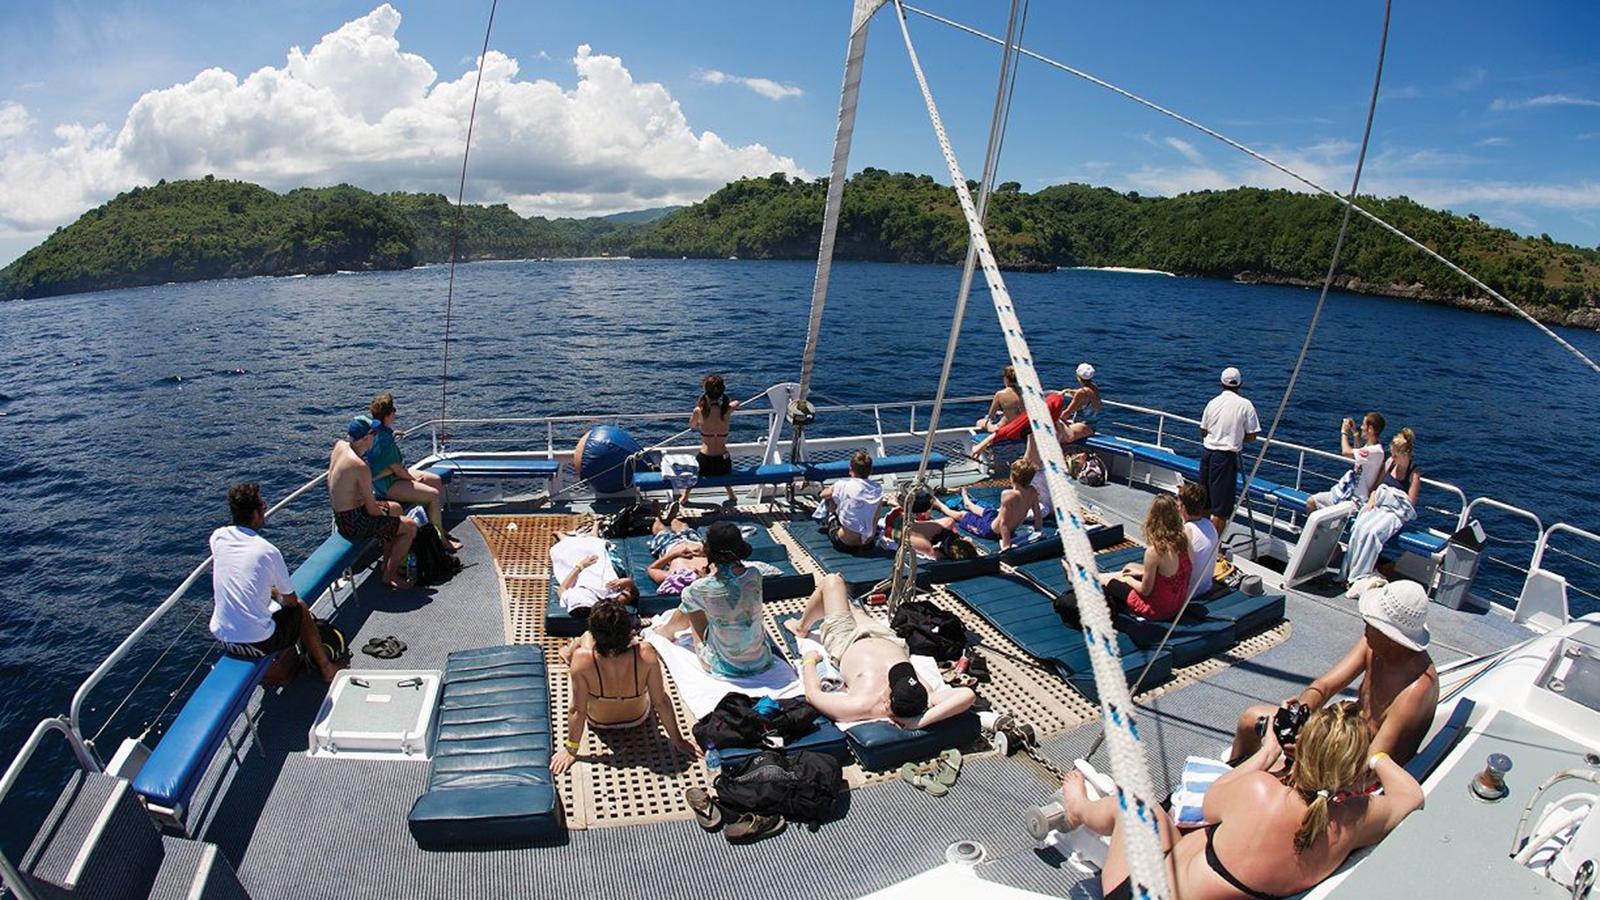 Where Is Bali Hai Island bali hai aristocat cruise experience: scuba diving and